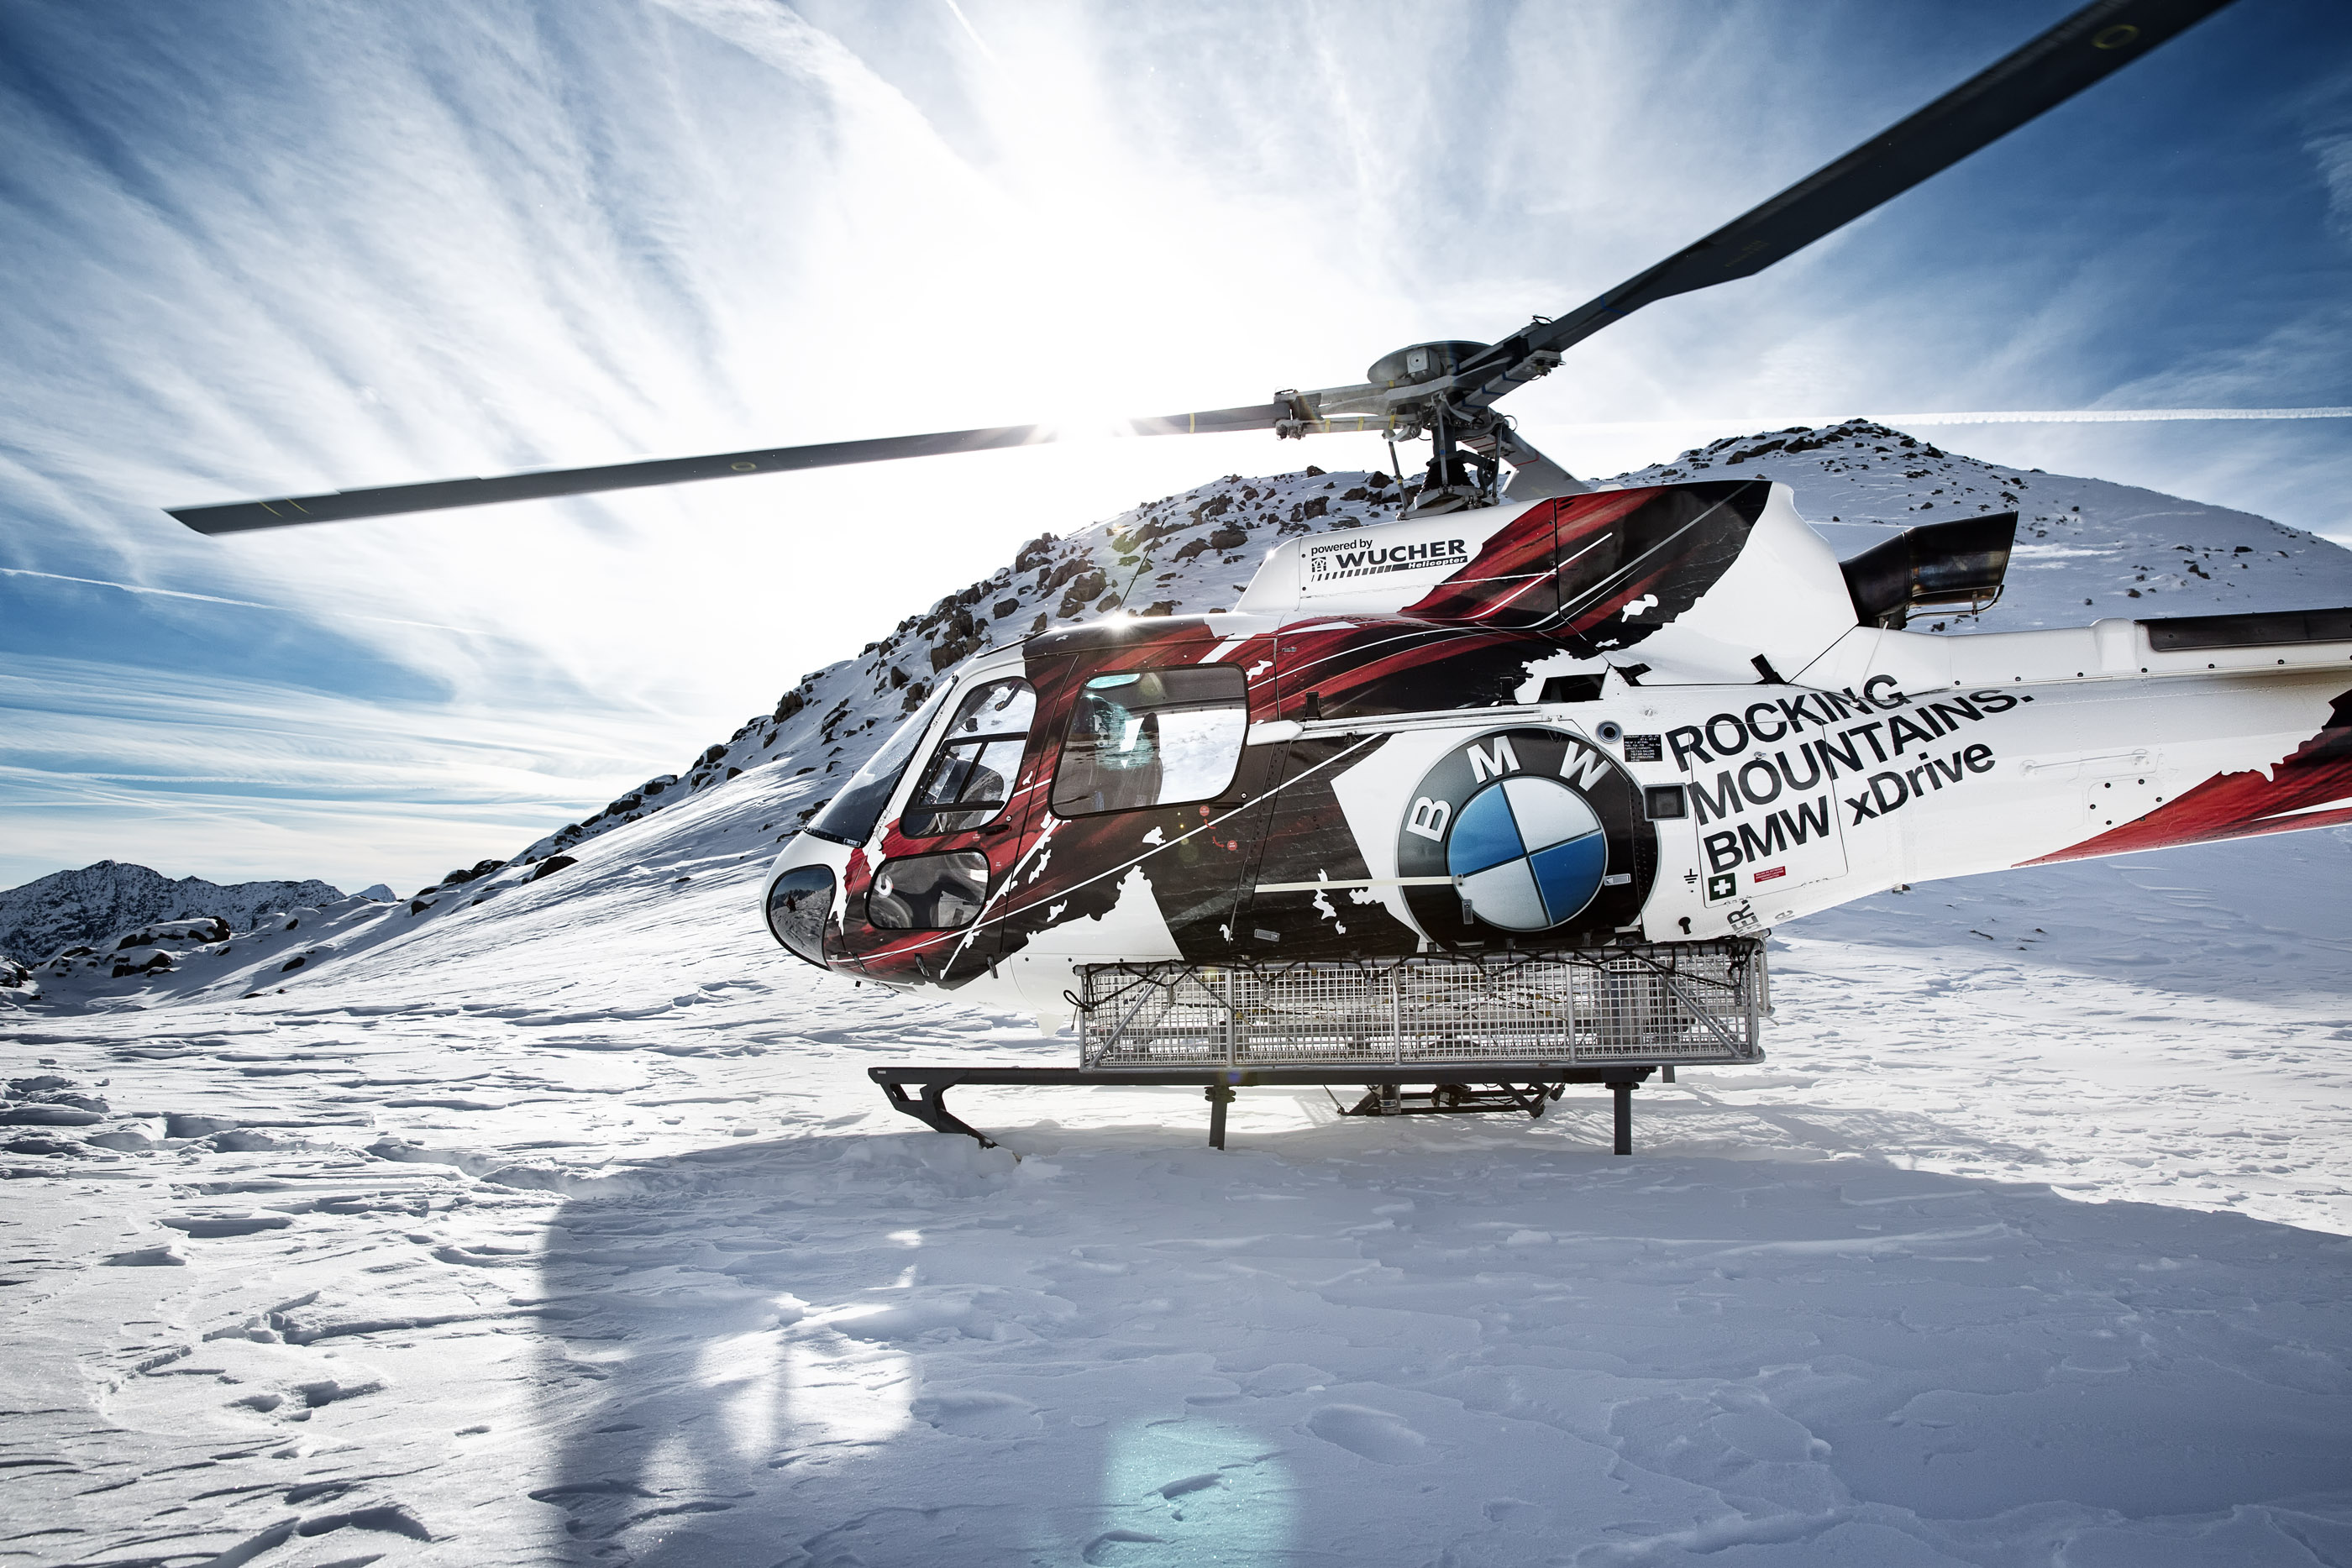 Hubschrauberflug ab Ludesch